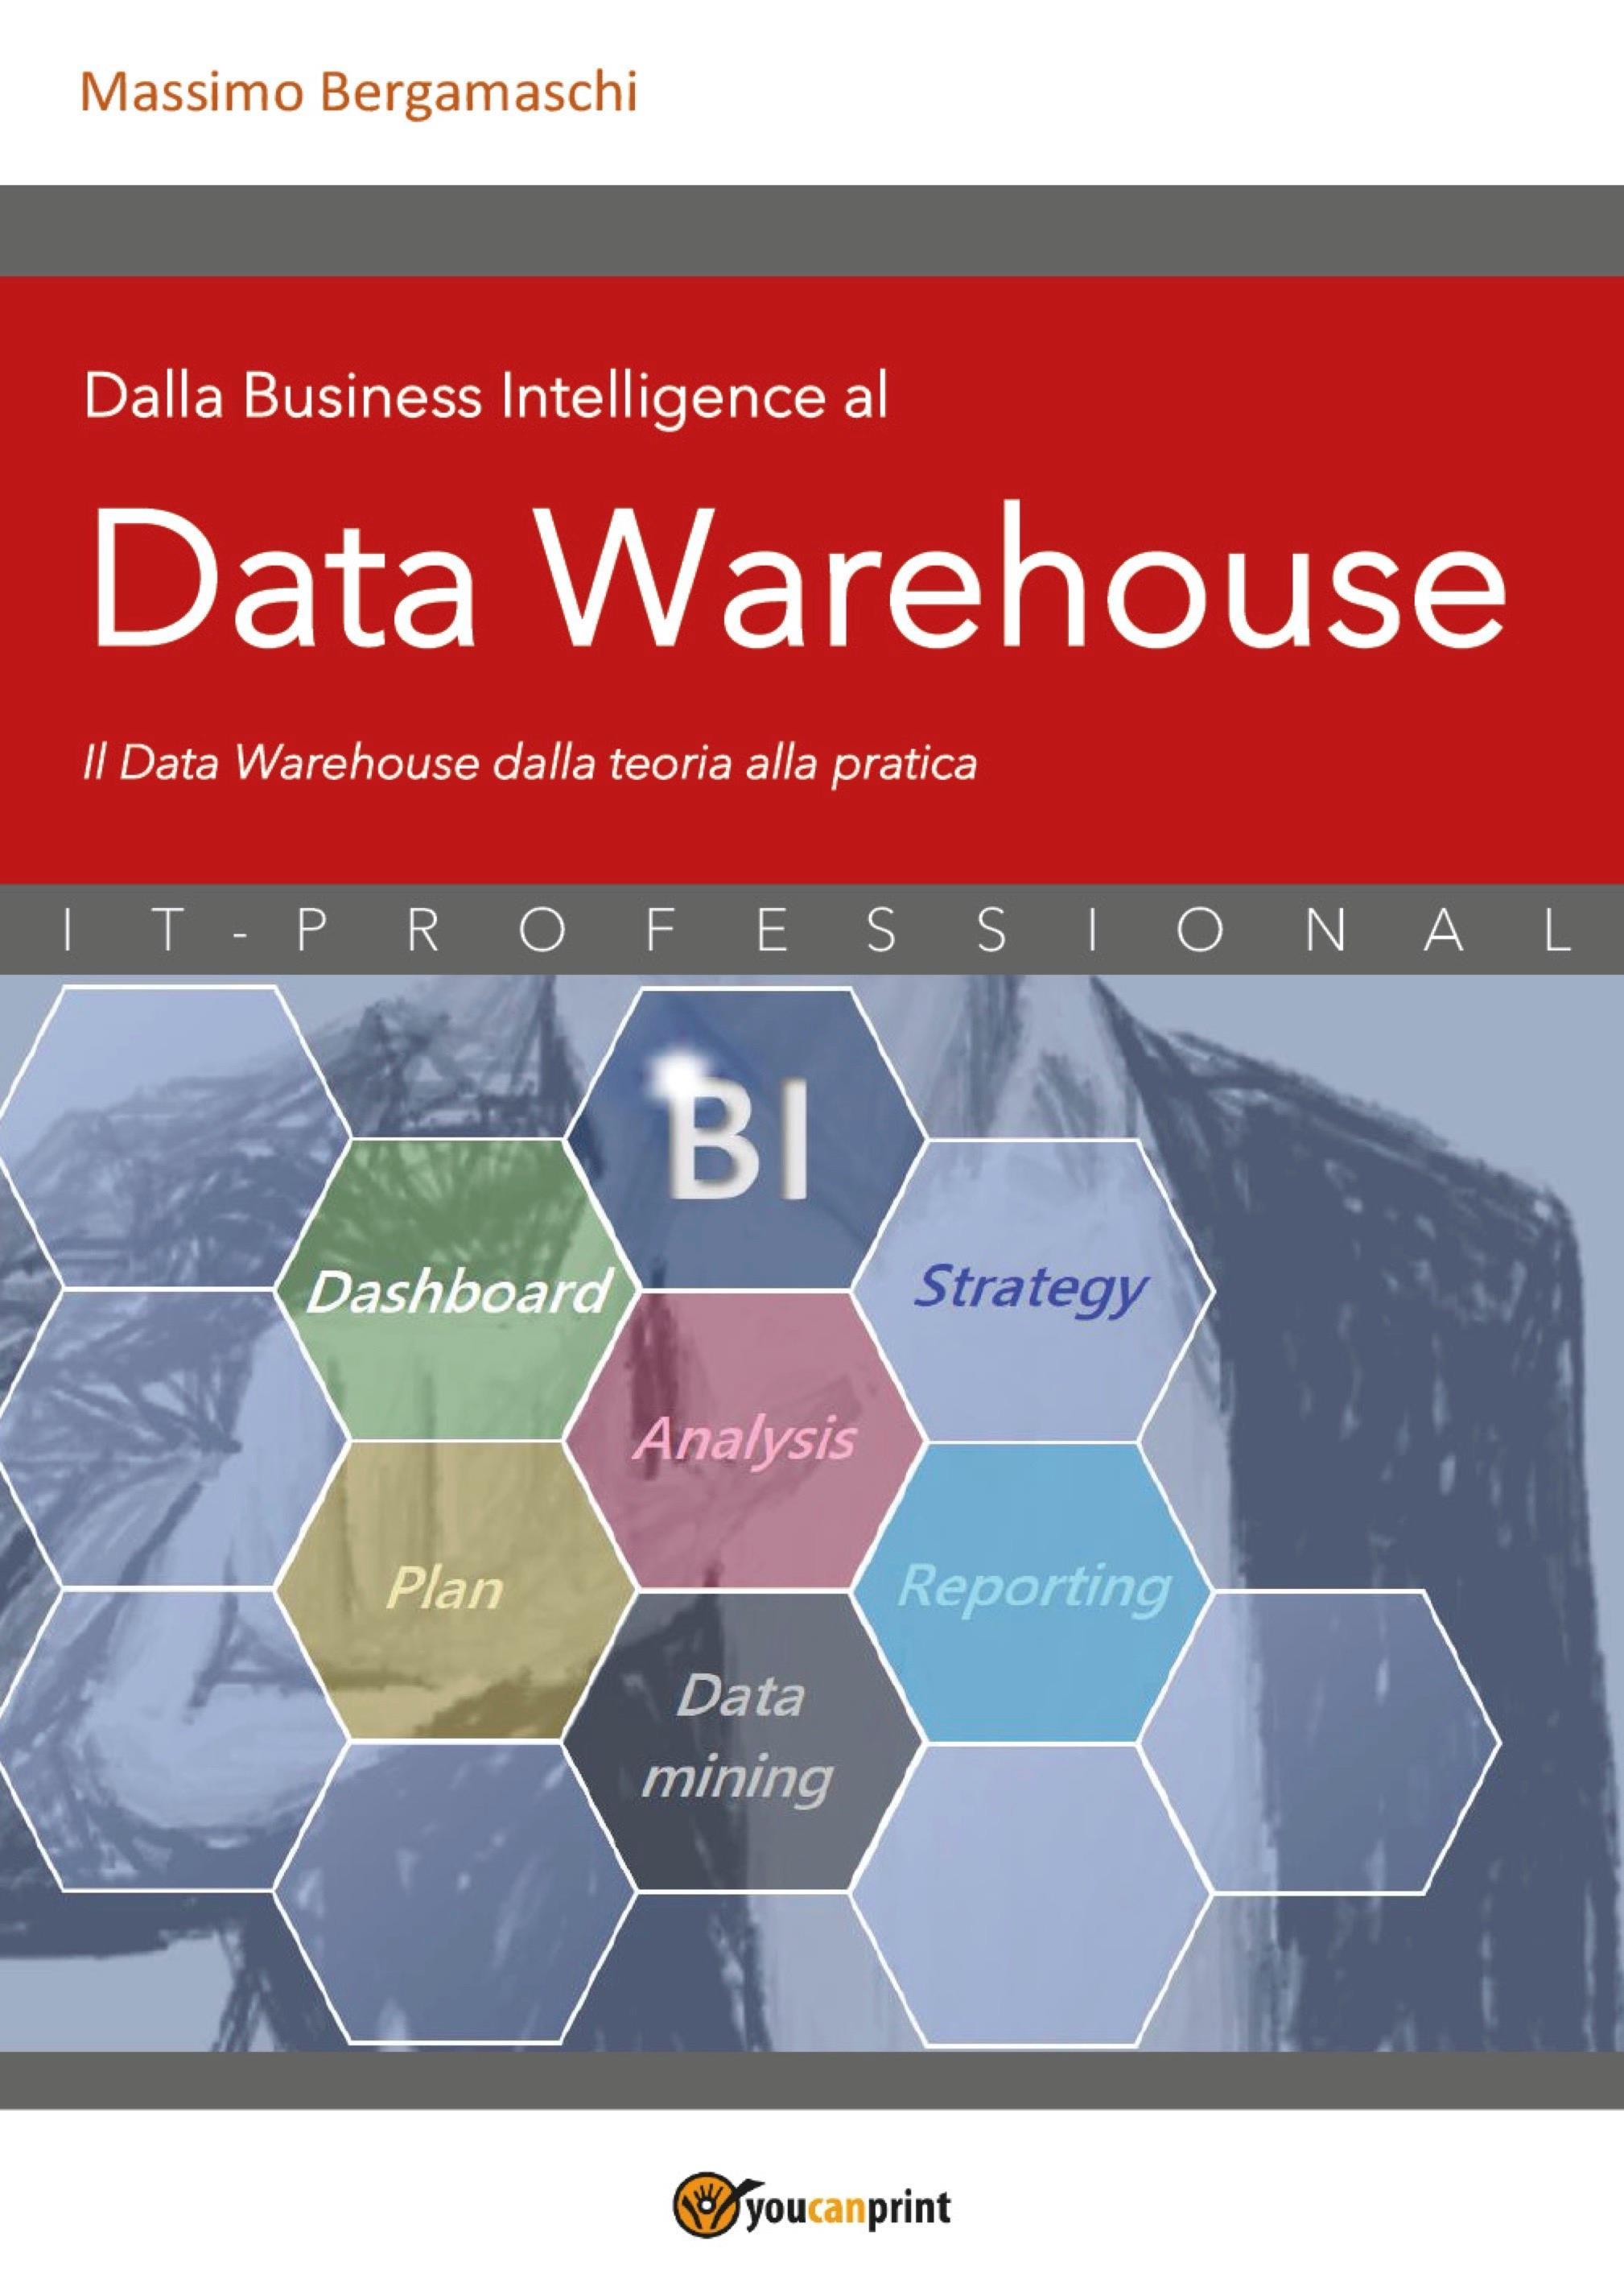 Dalla Business Intelligence al Data Warehouse